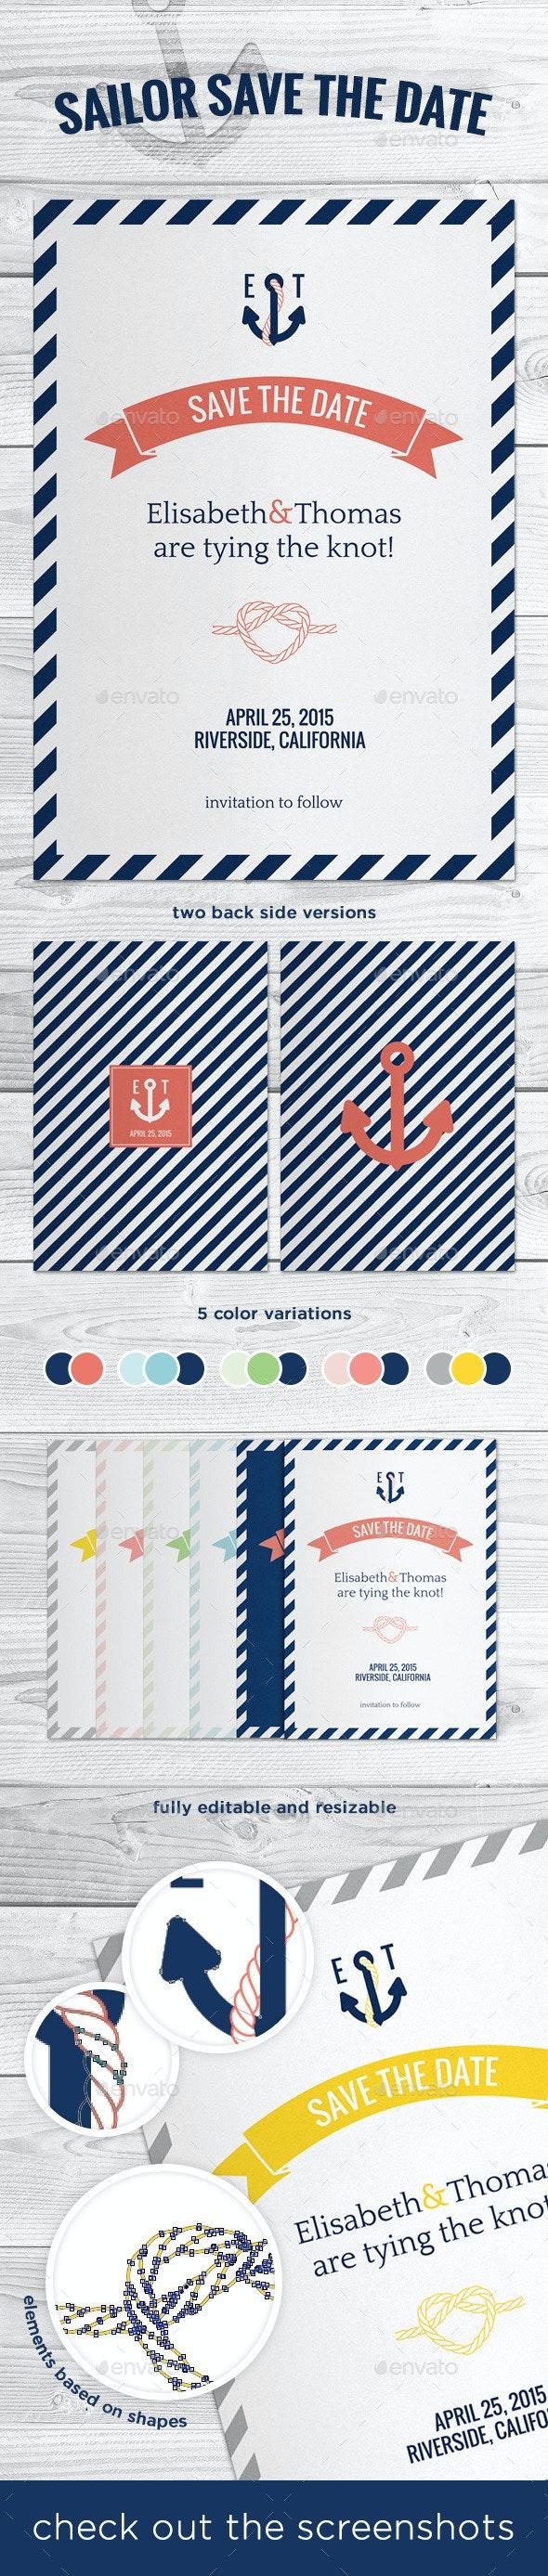 Sailor Marine Save The Date - Weddings Cards & Invites